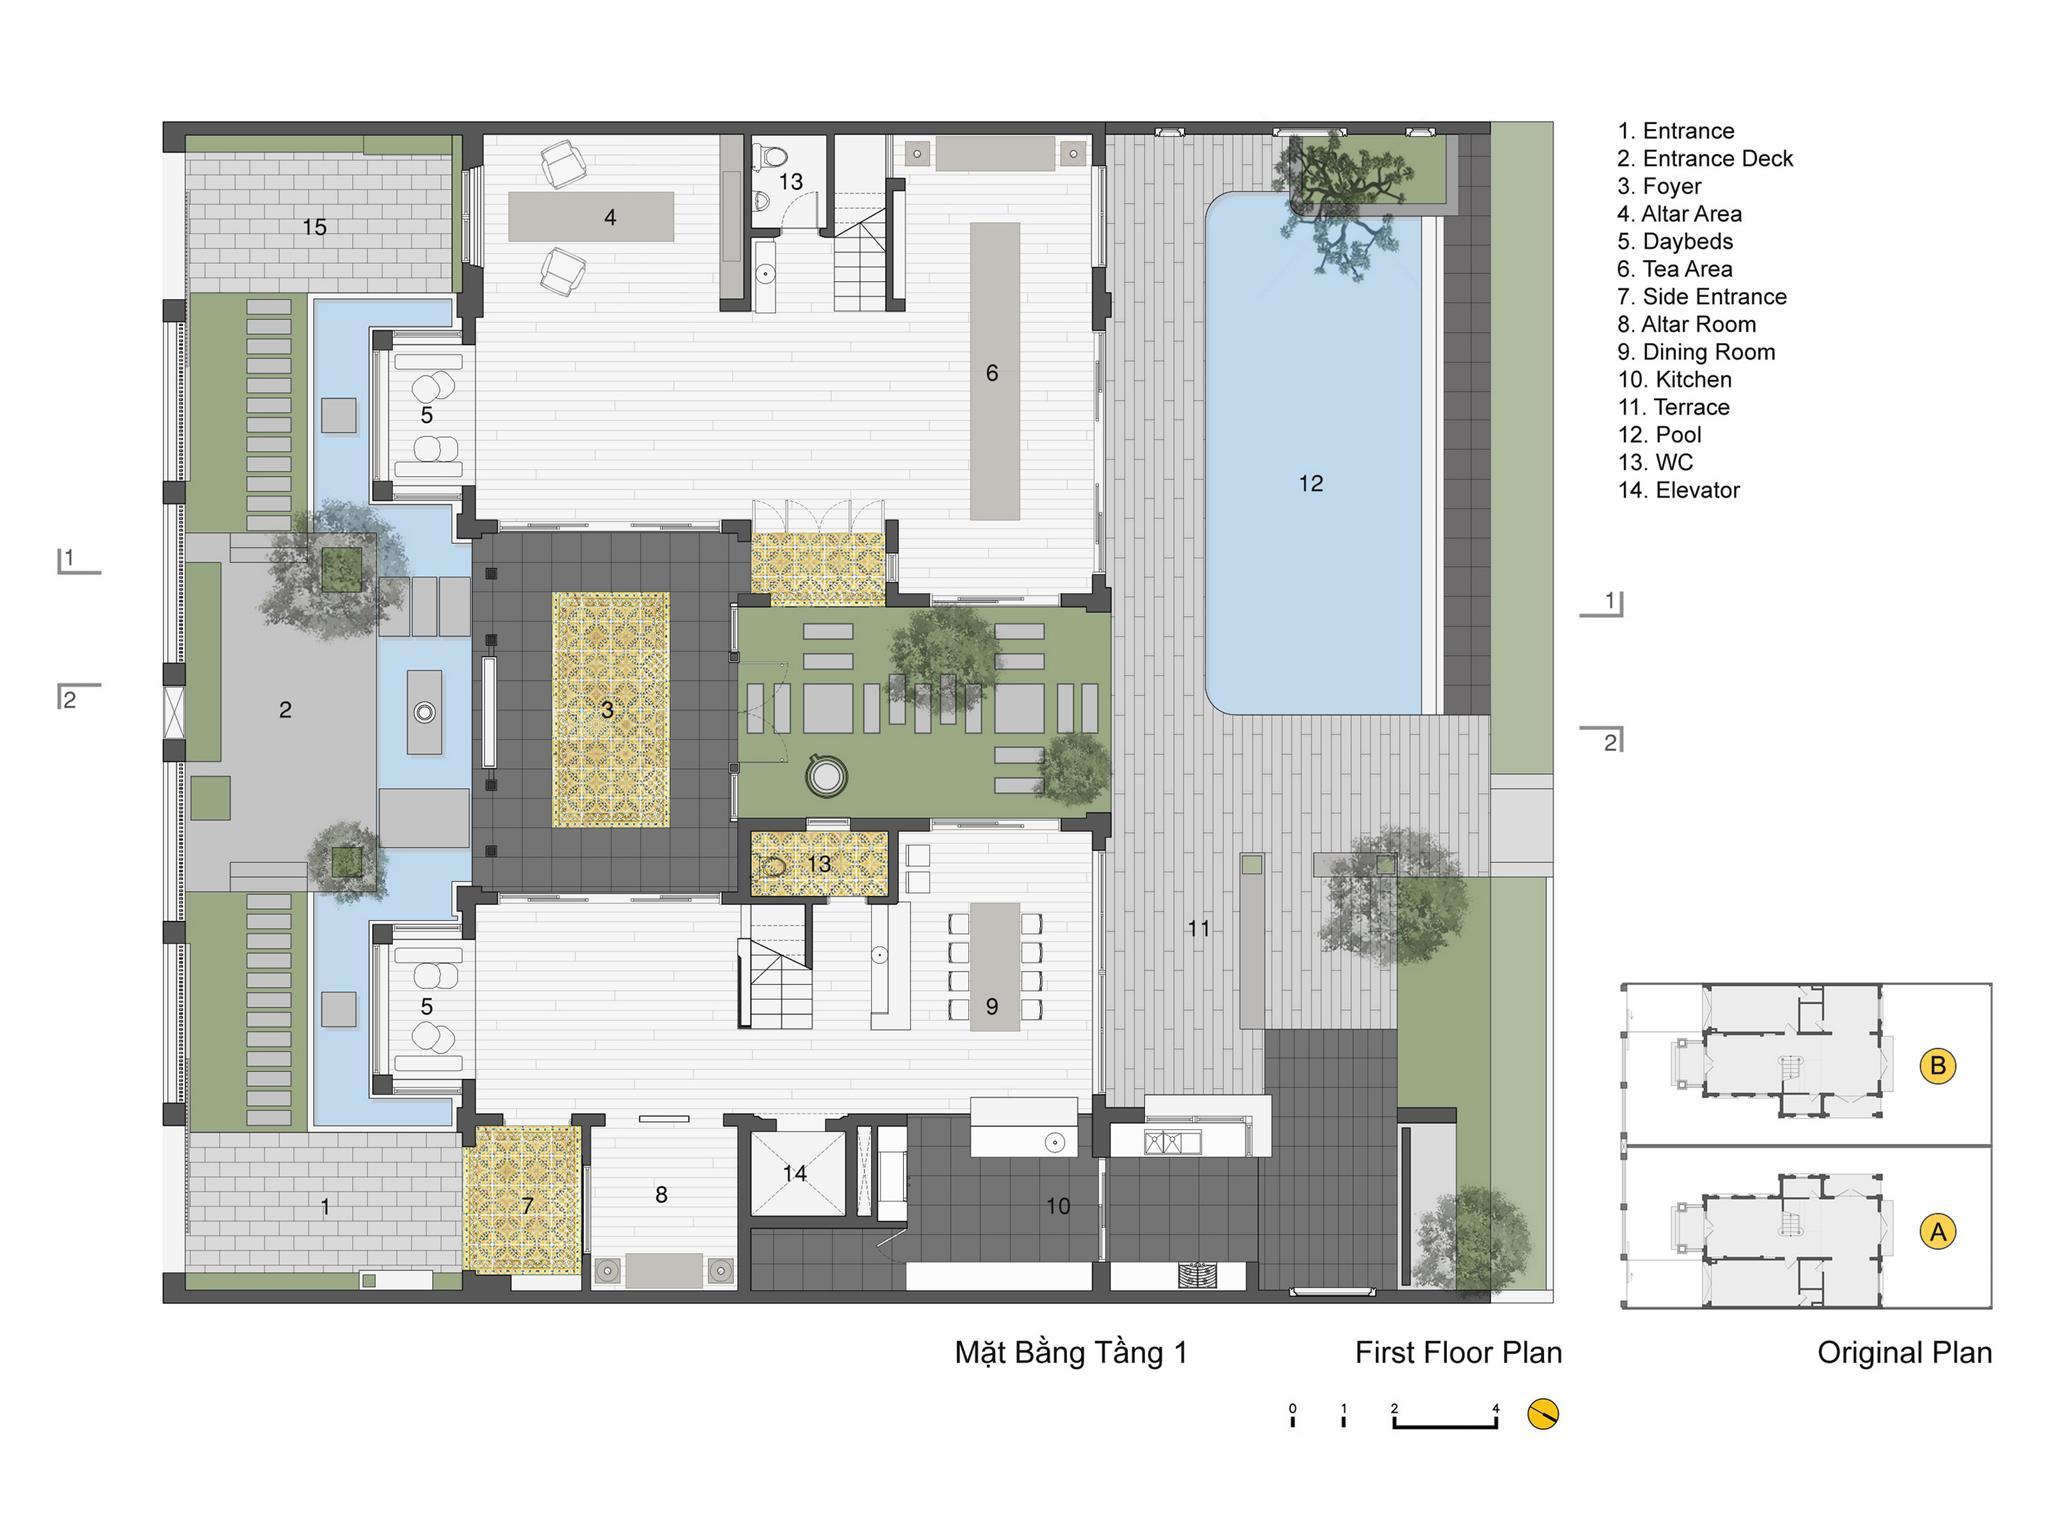 30-Fist Floor Plan (Copy)